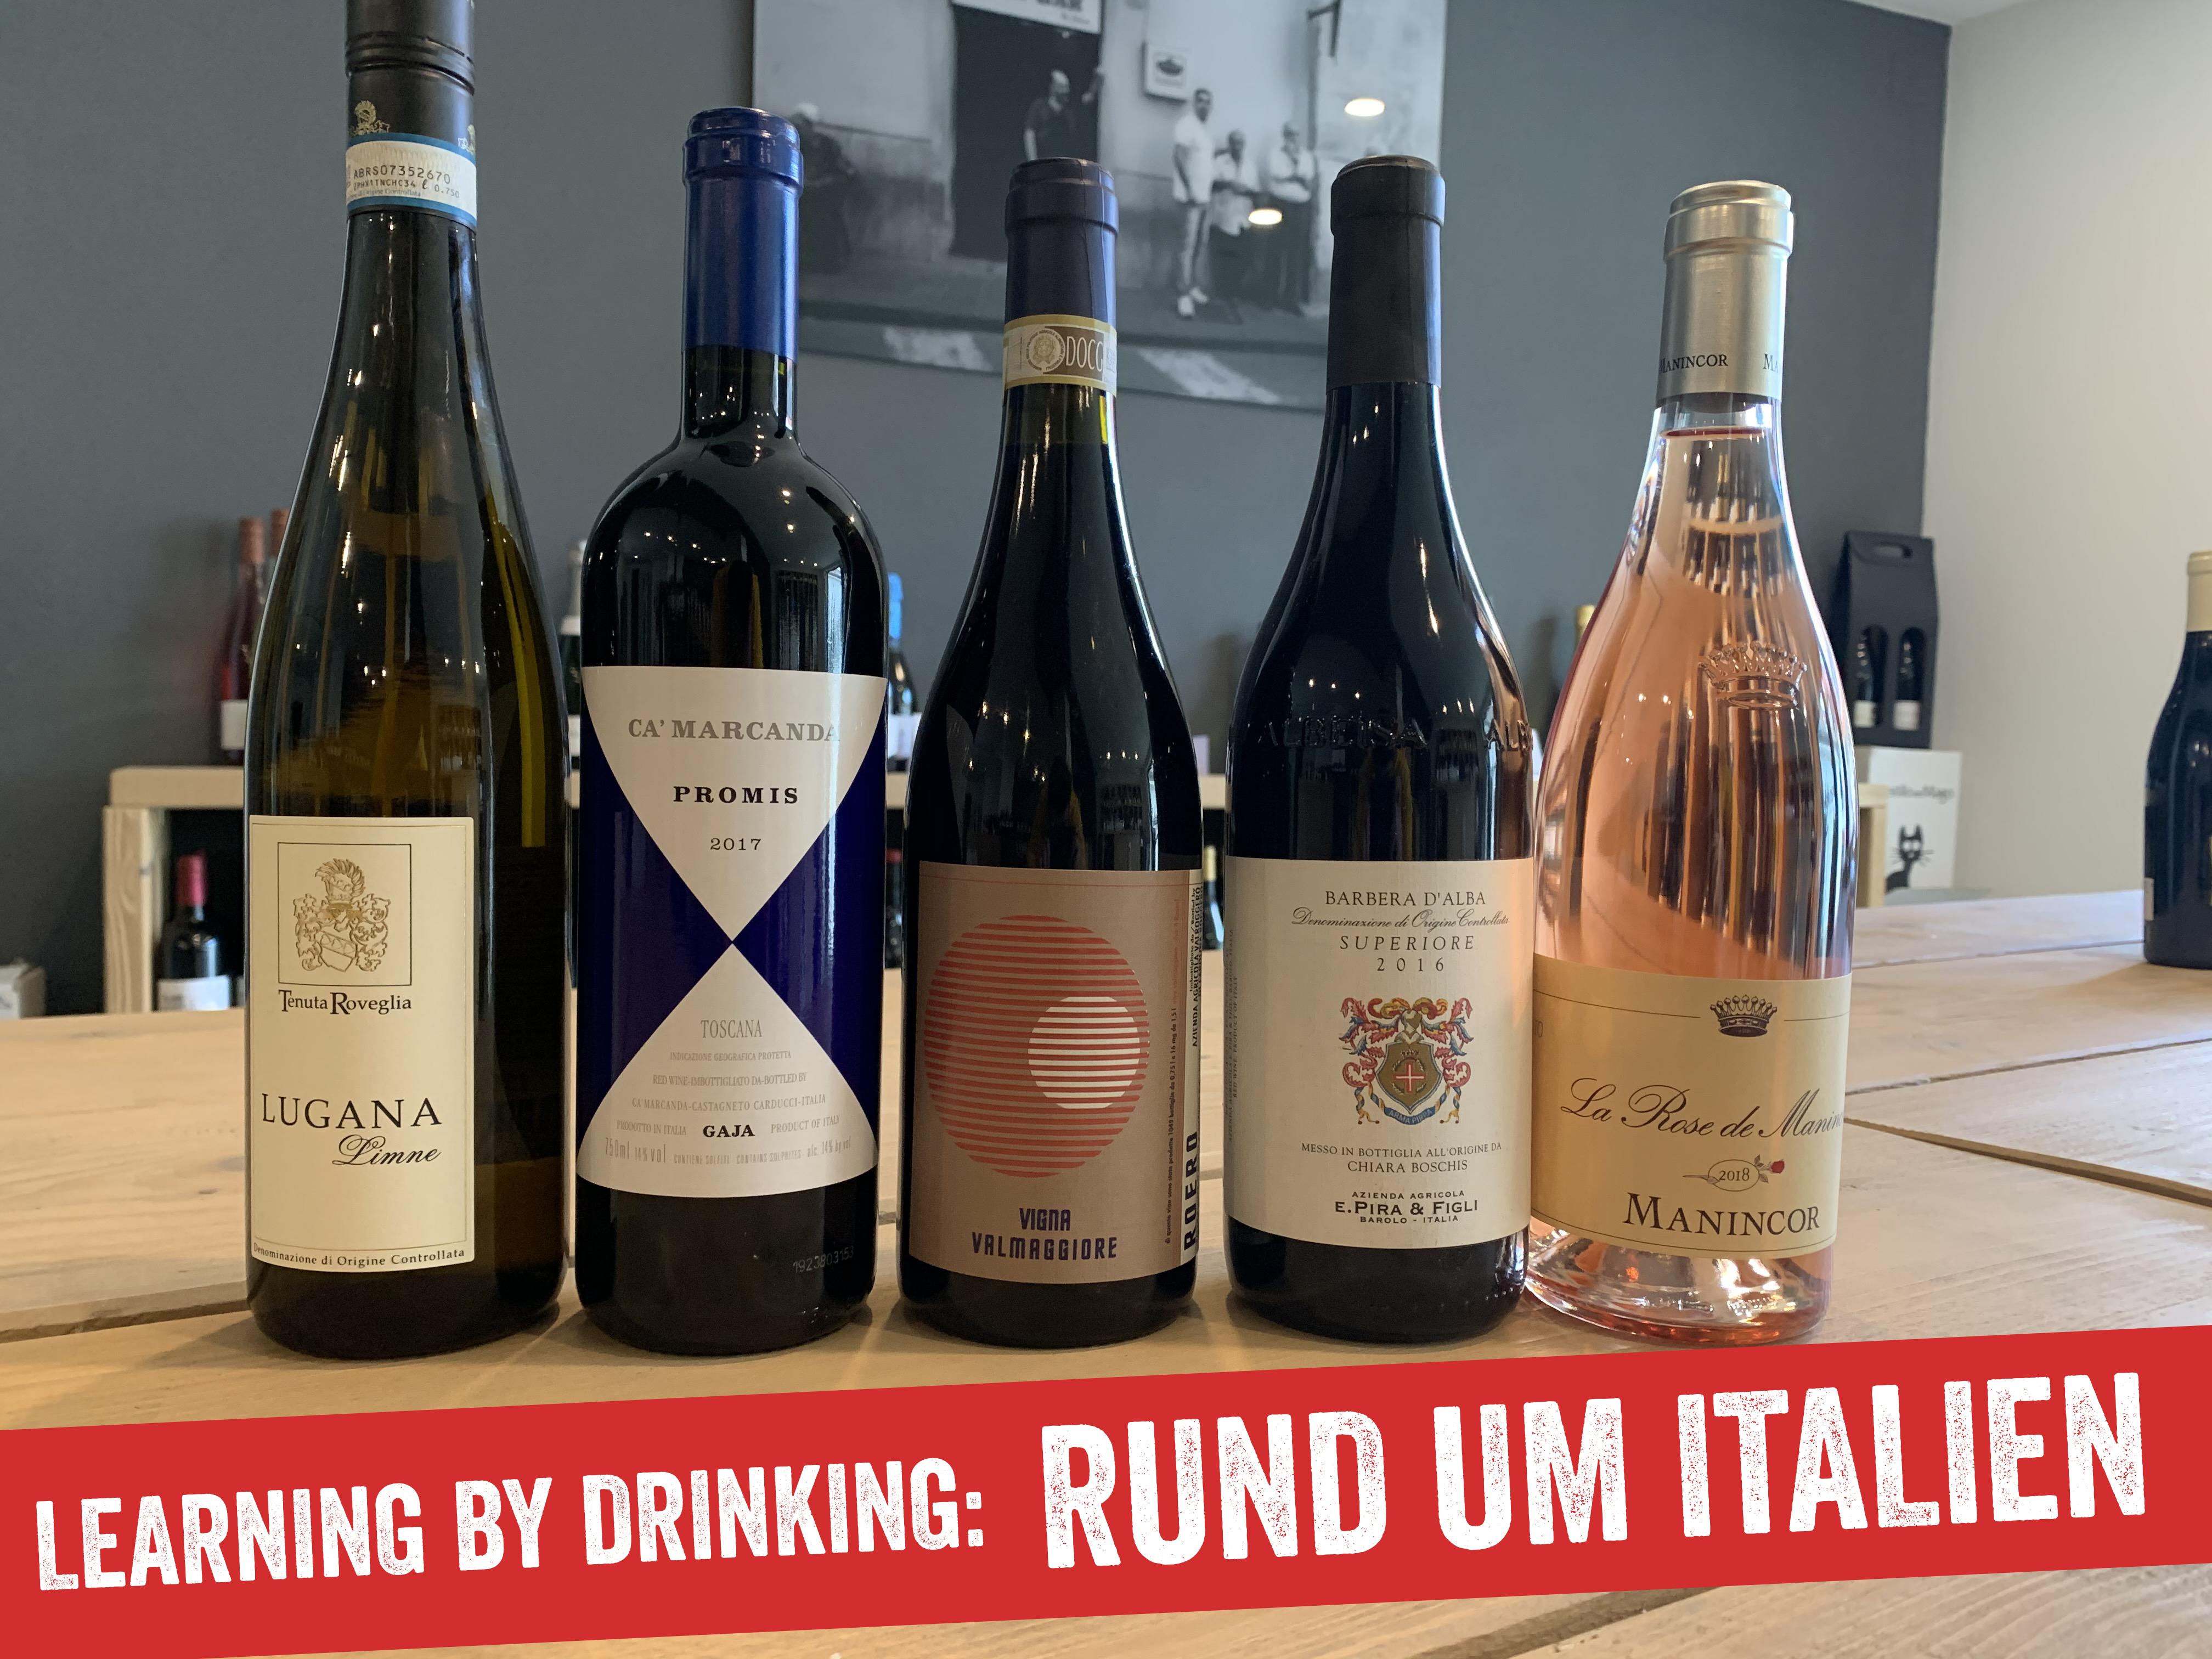 LEARNING BY DRINKING: Rund um Italien 20.11.2021